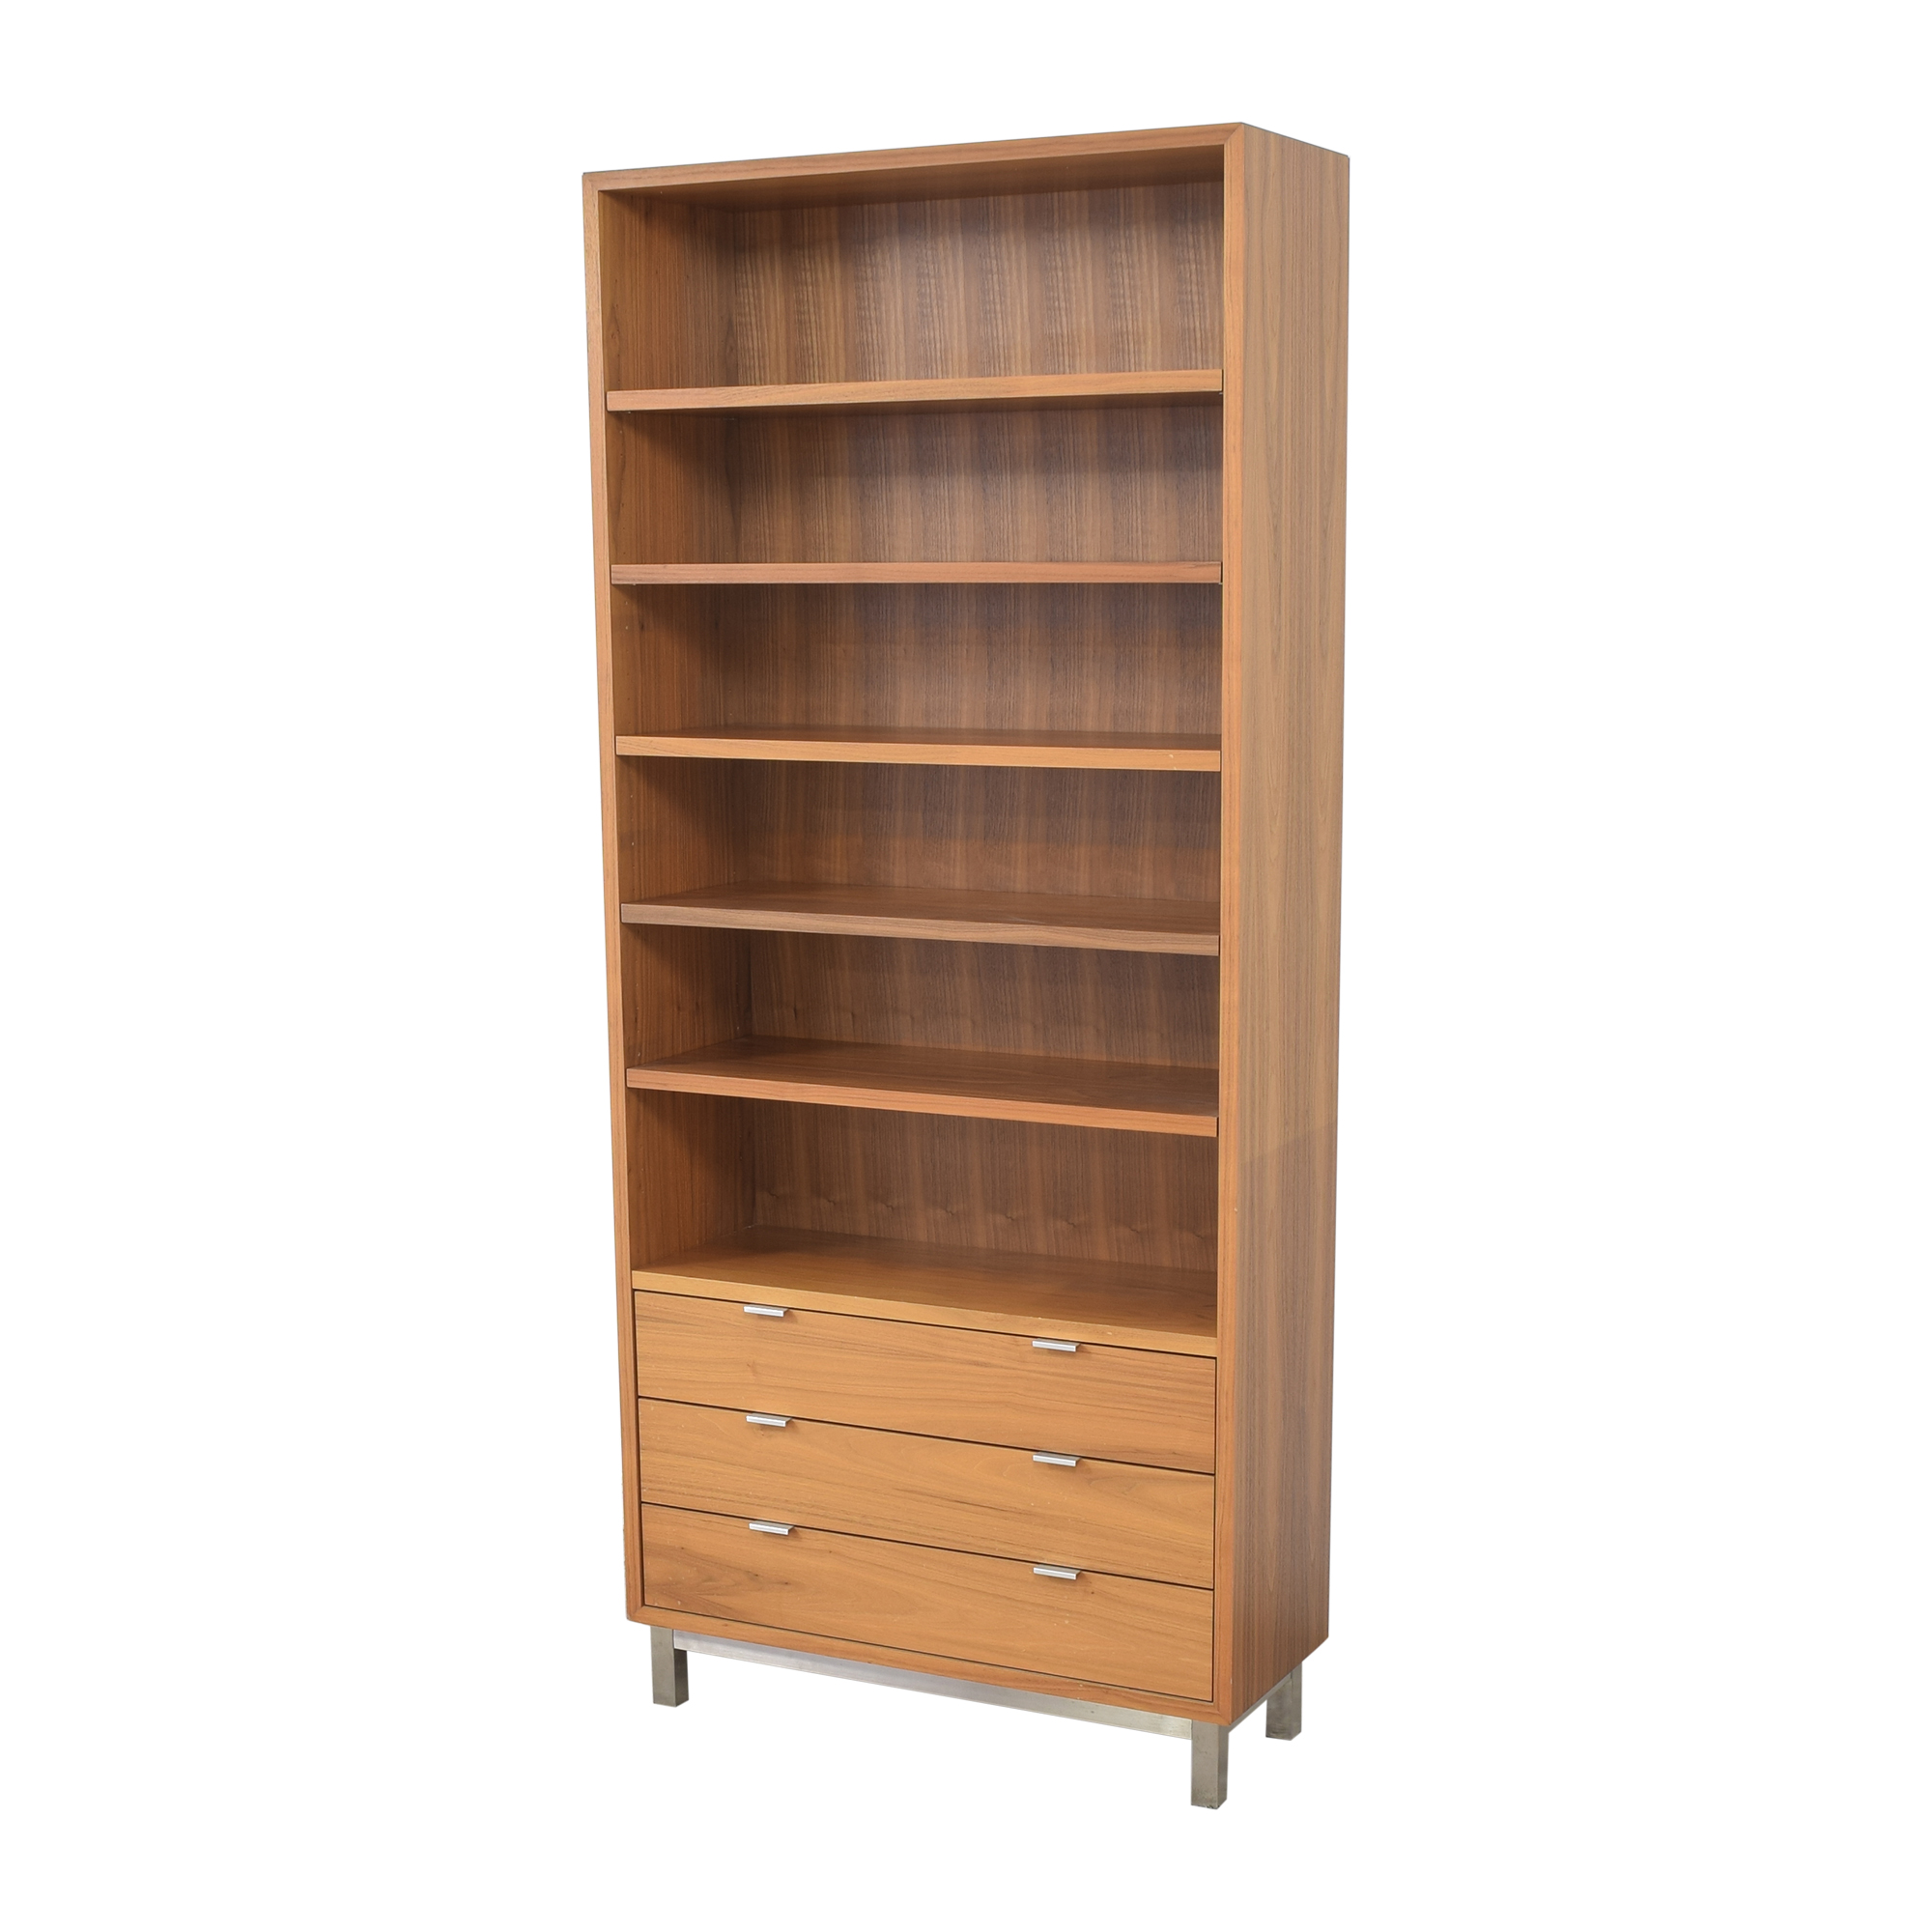 Room & Board Room & Board Copenhagen Three Drawer Bookcase discount